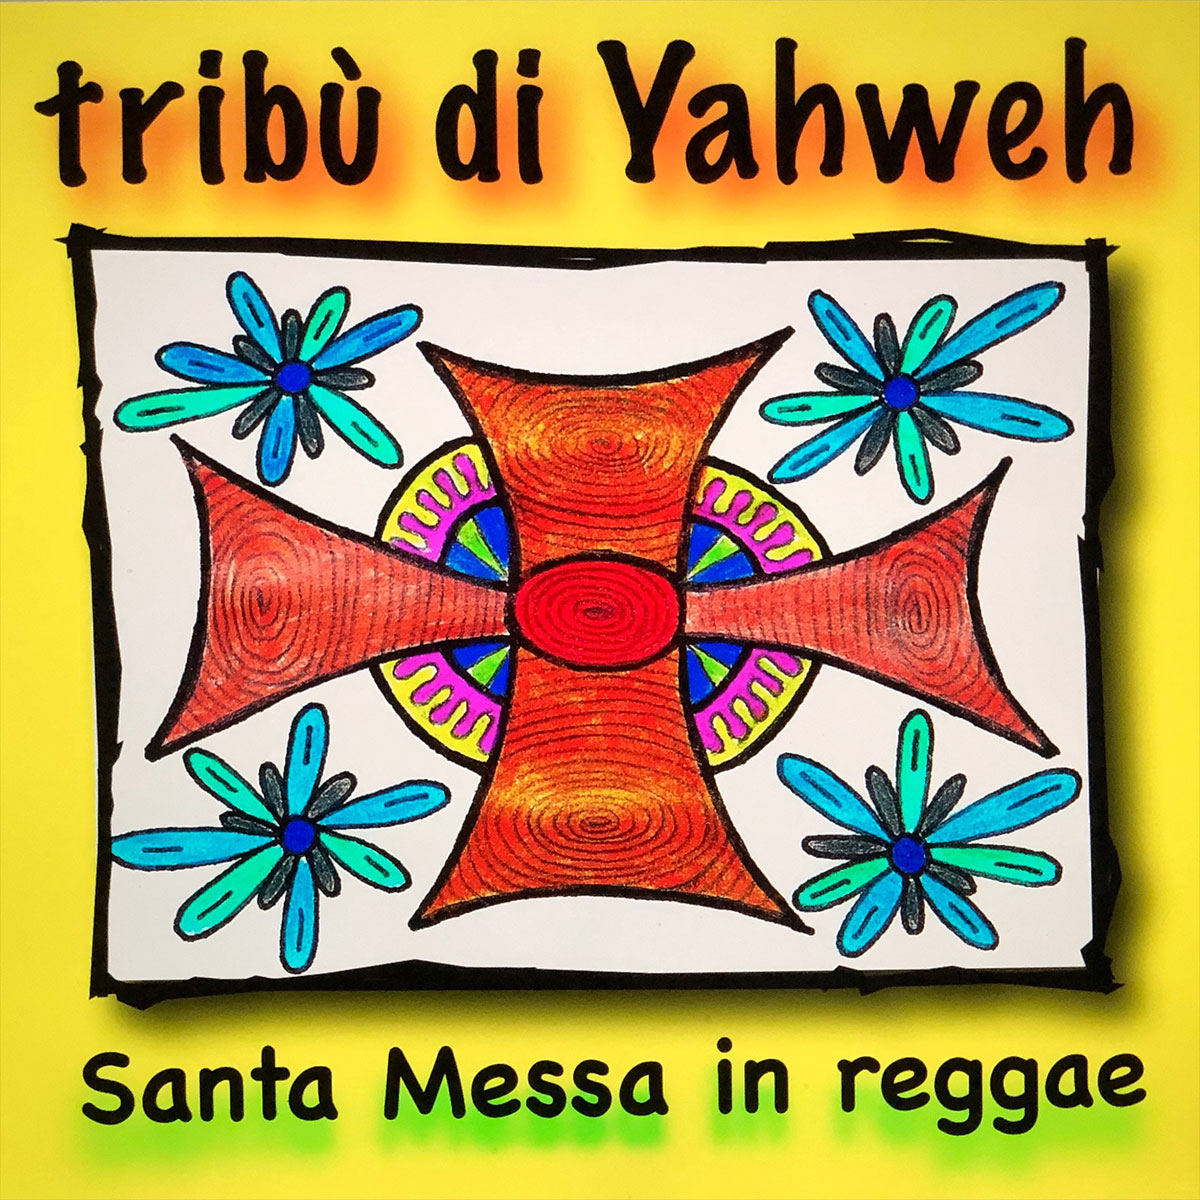 http://www.tribudiyahweh.com/wp/wp-content/uploads/2019/02/Santa-Messa-in-reggae.jpg